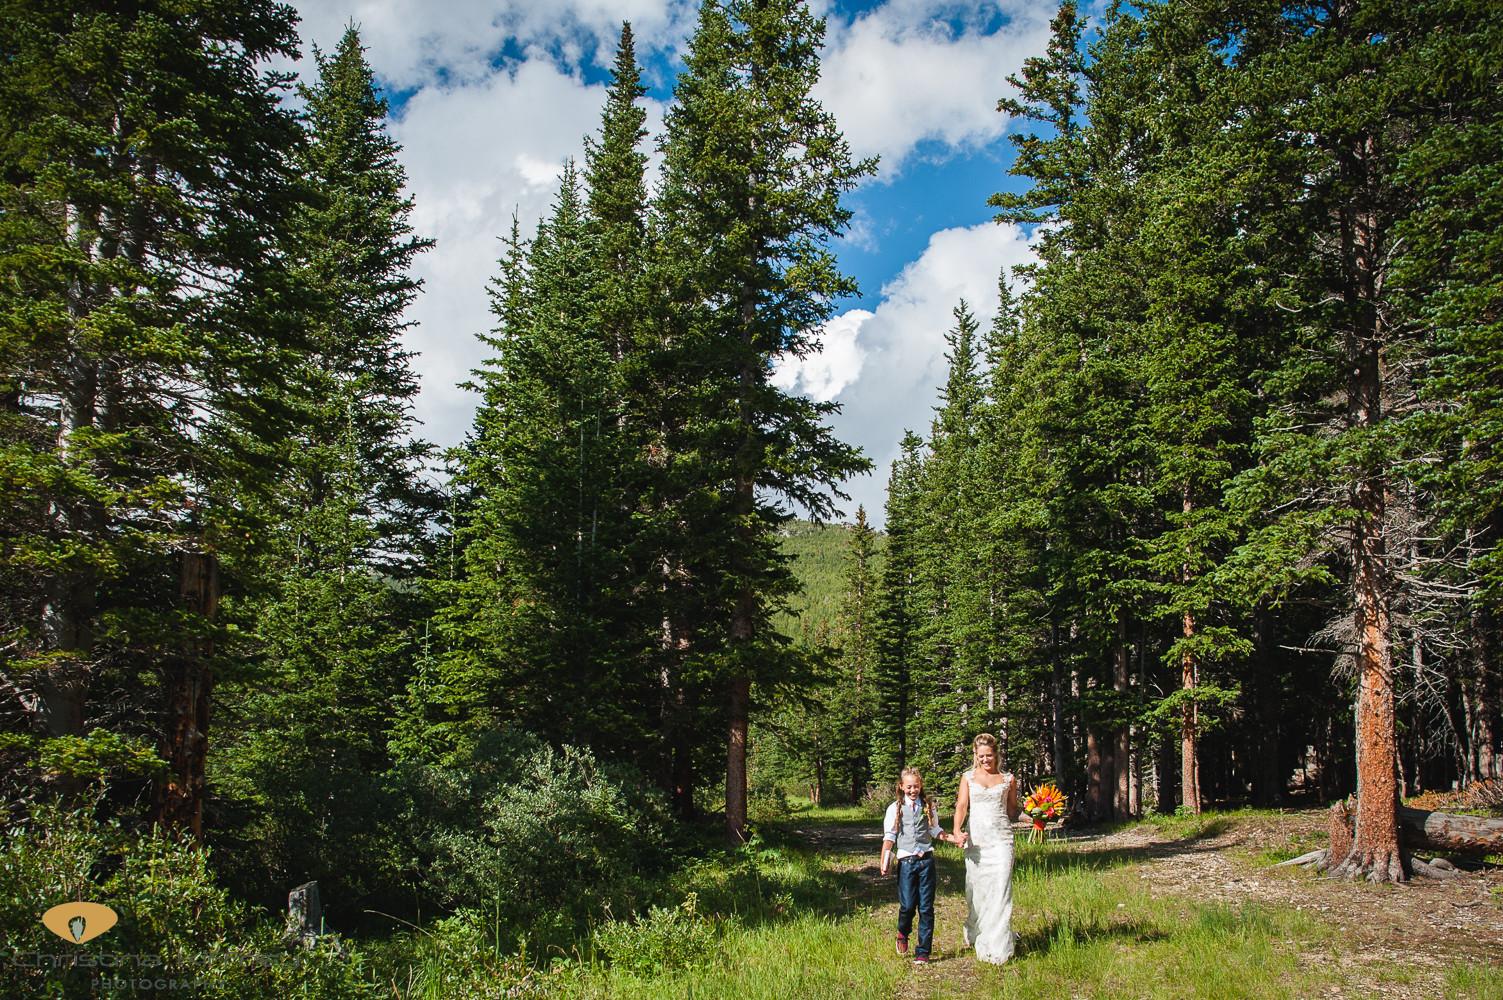 ckp-Colorado-Family-Elopement-0016.jpg